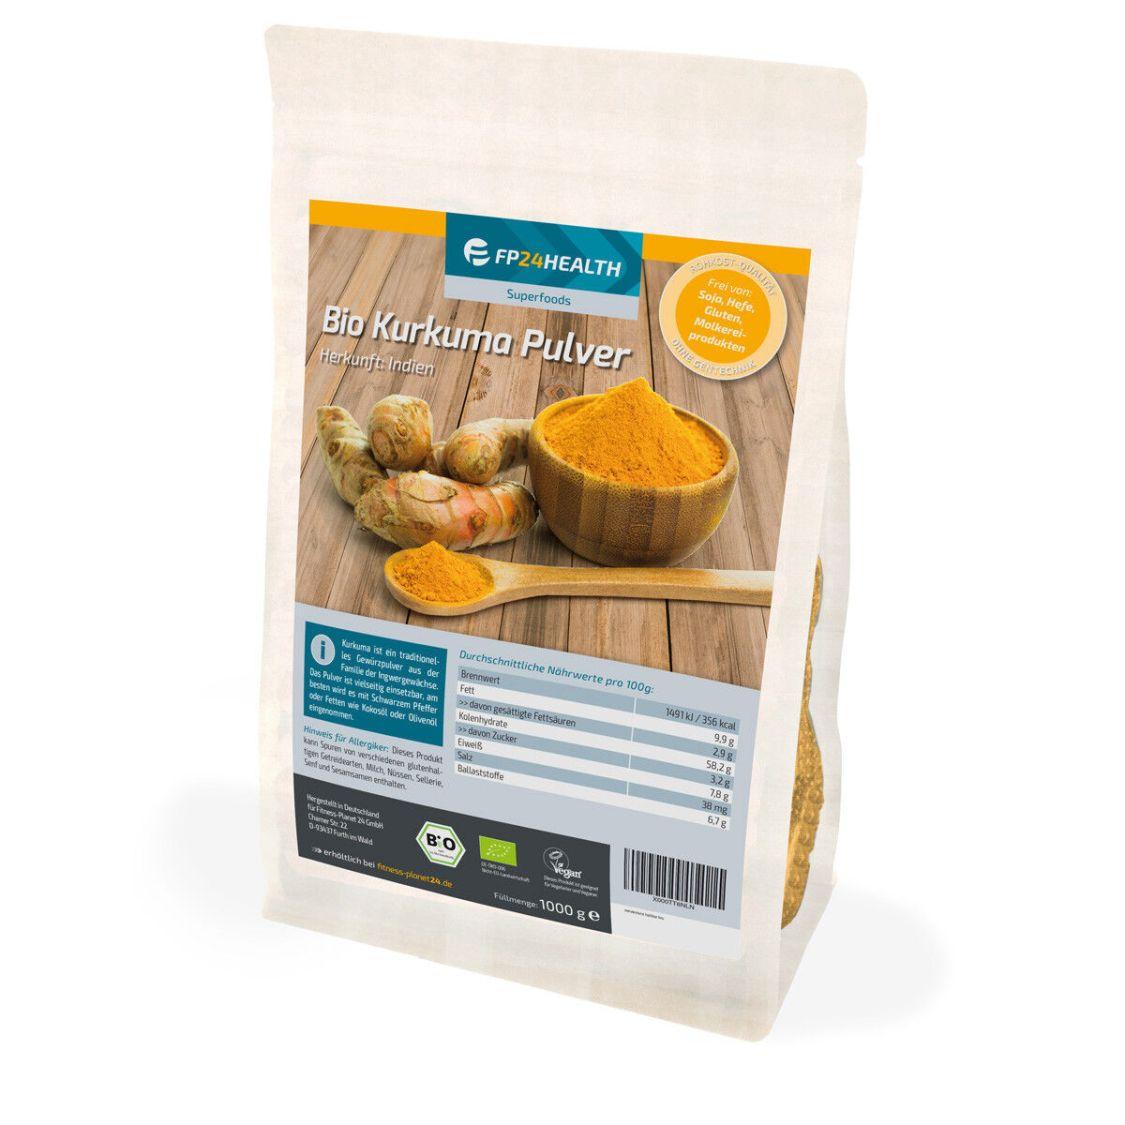 FP24 Health BIO Kurkuma-Pulver 1kg - Zippbeutel-Curcuma gemahlen - Top Qualität